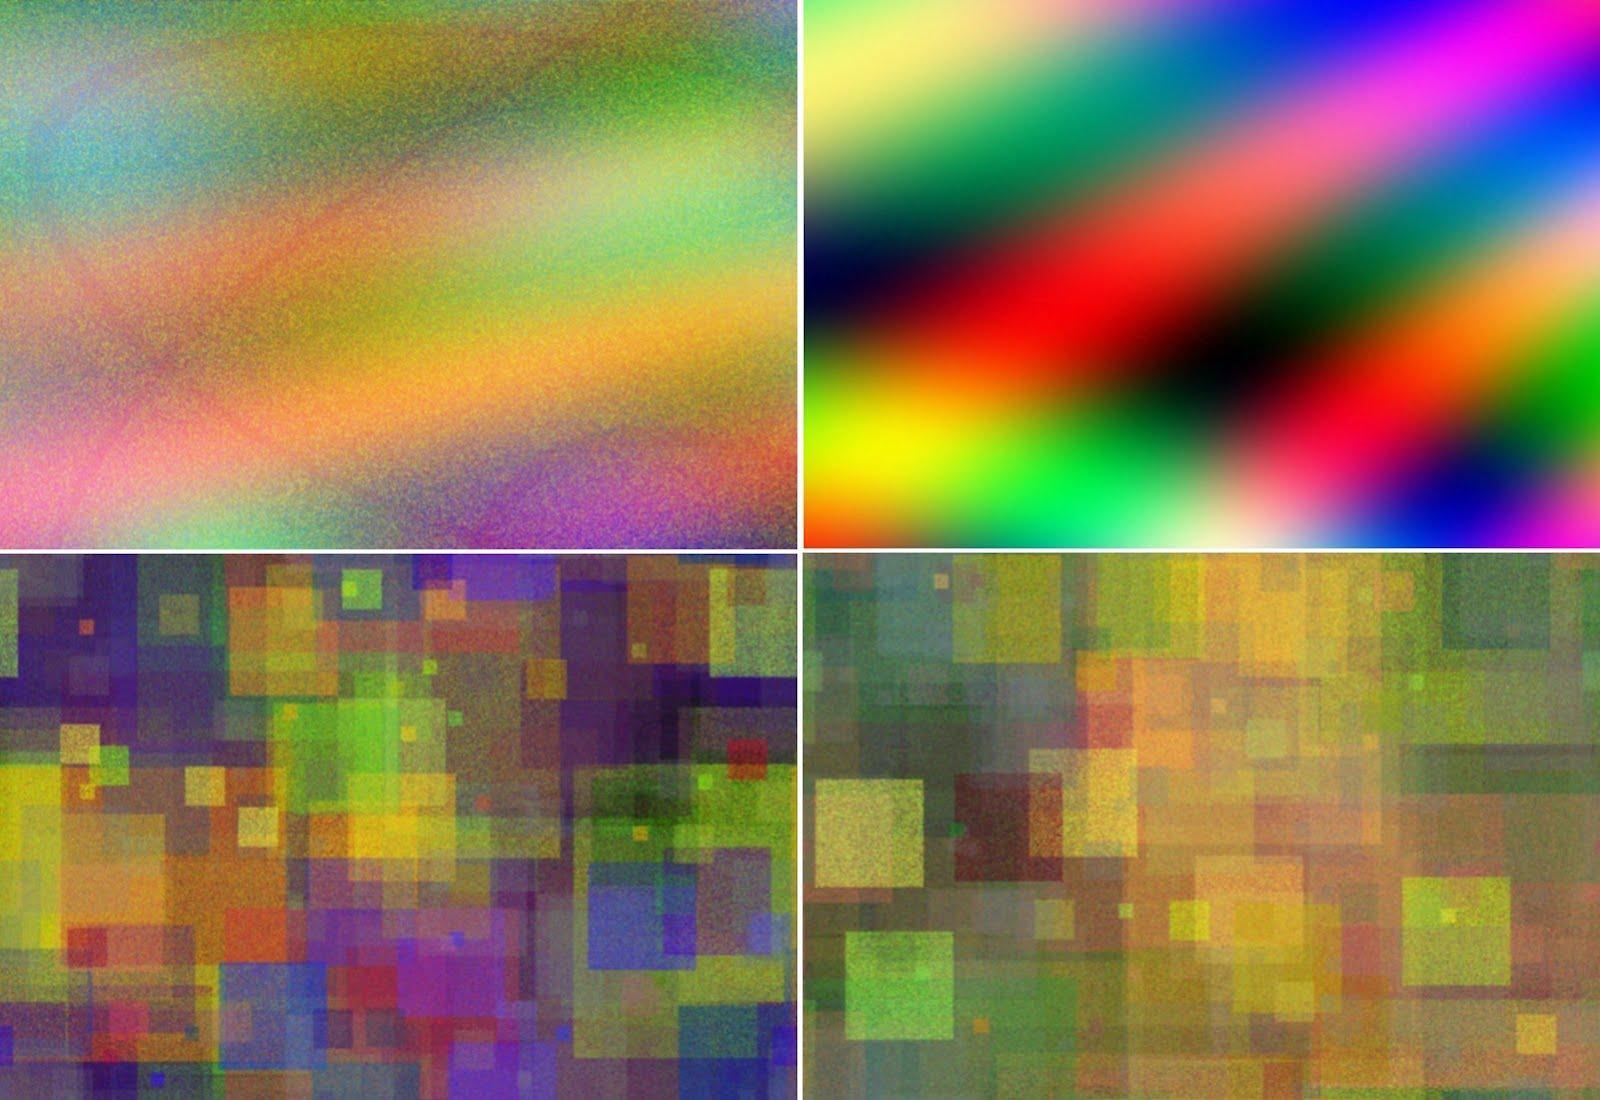 http://3.bp.blogspot.com/-BXKSXQk8OO0/T1_8GOm5o9I/AAAAAAAAAa8/0WgpJ0Vh3rY/s1600/composite.jpg